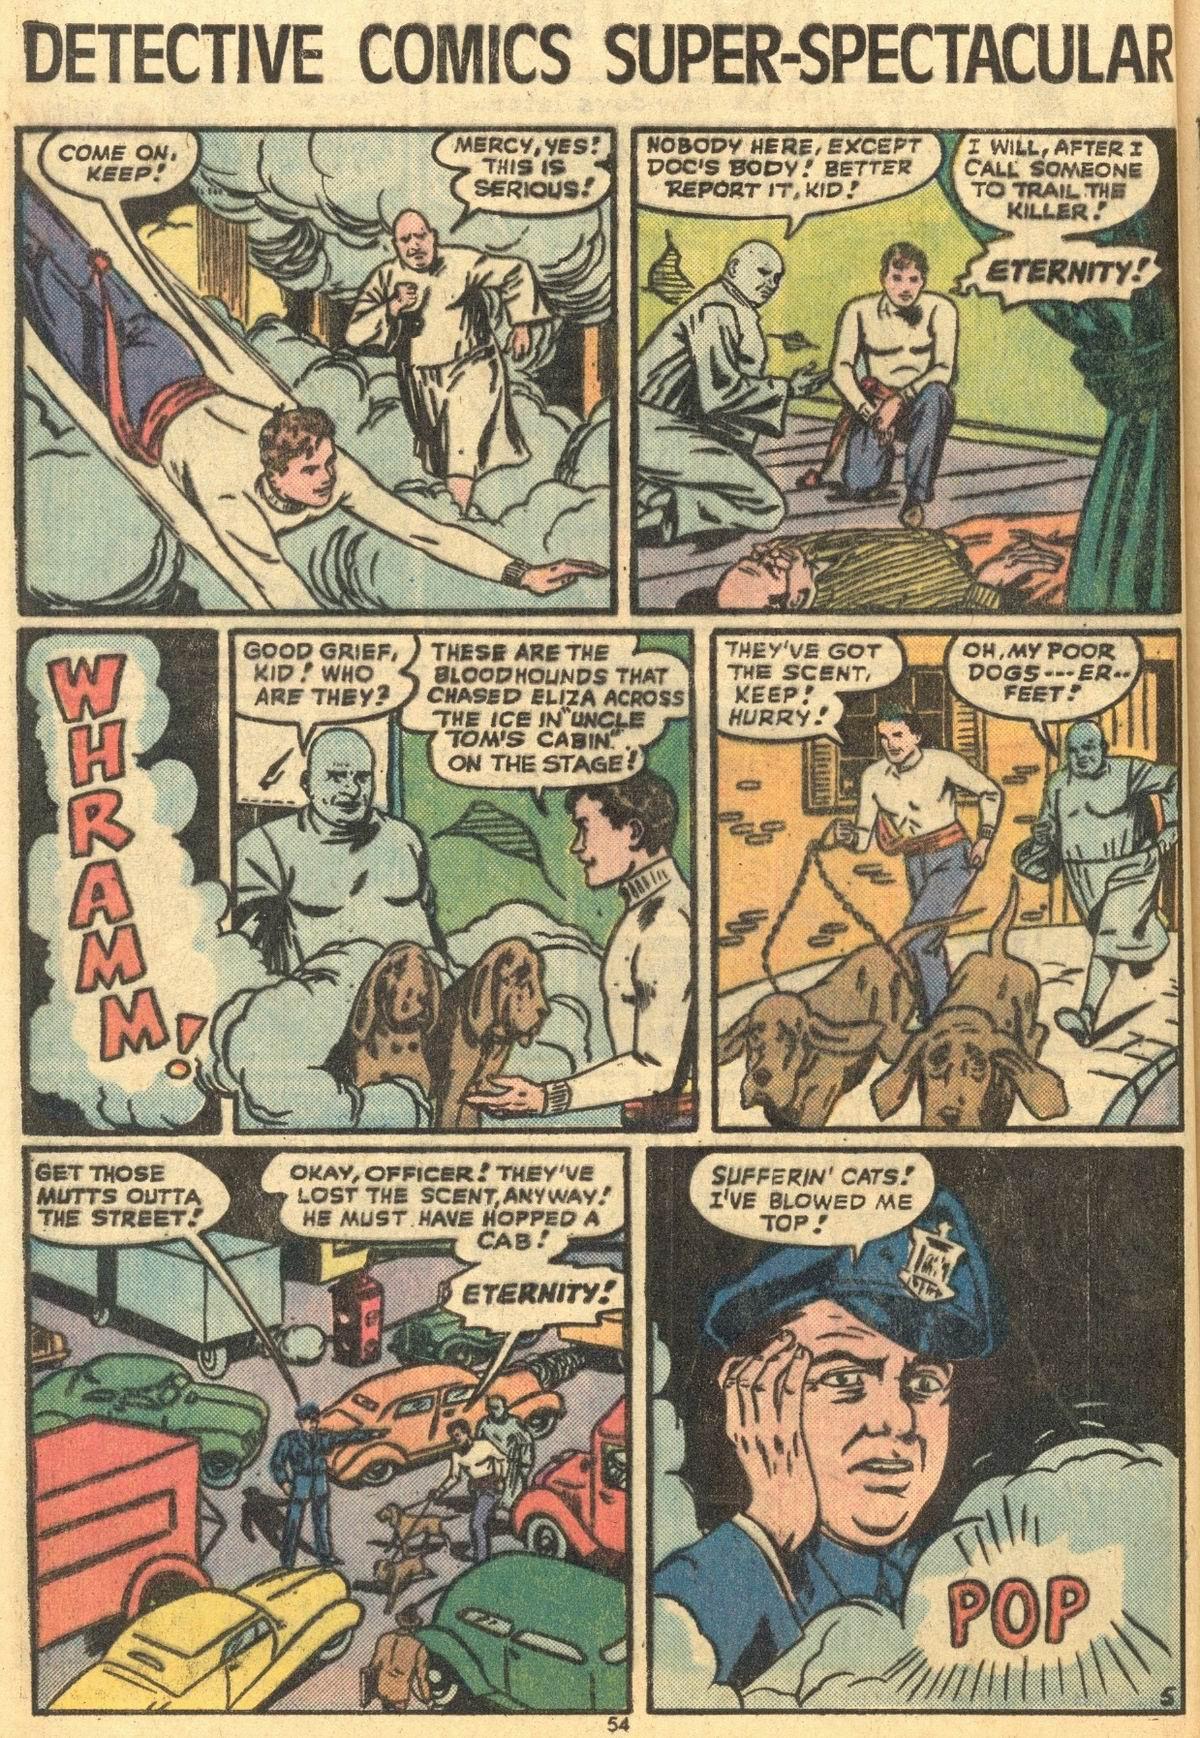 Detective Comics (1937) 444 Page 53